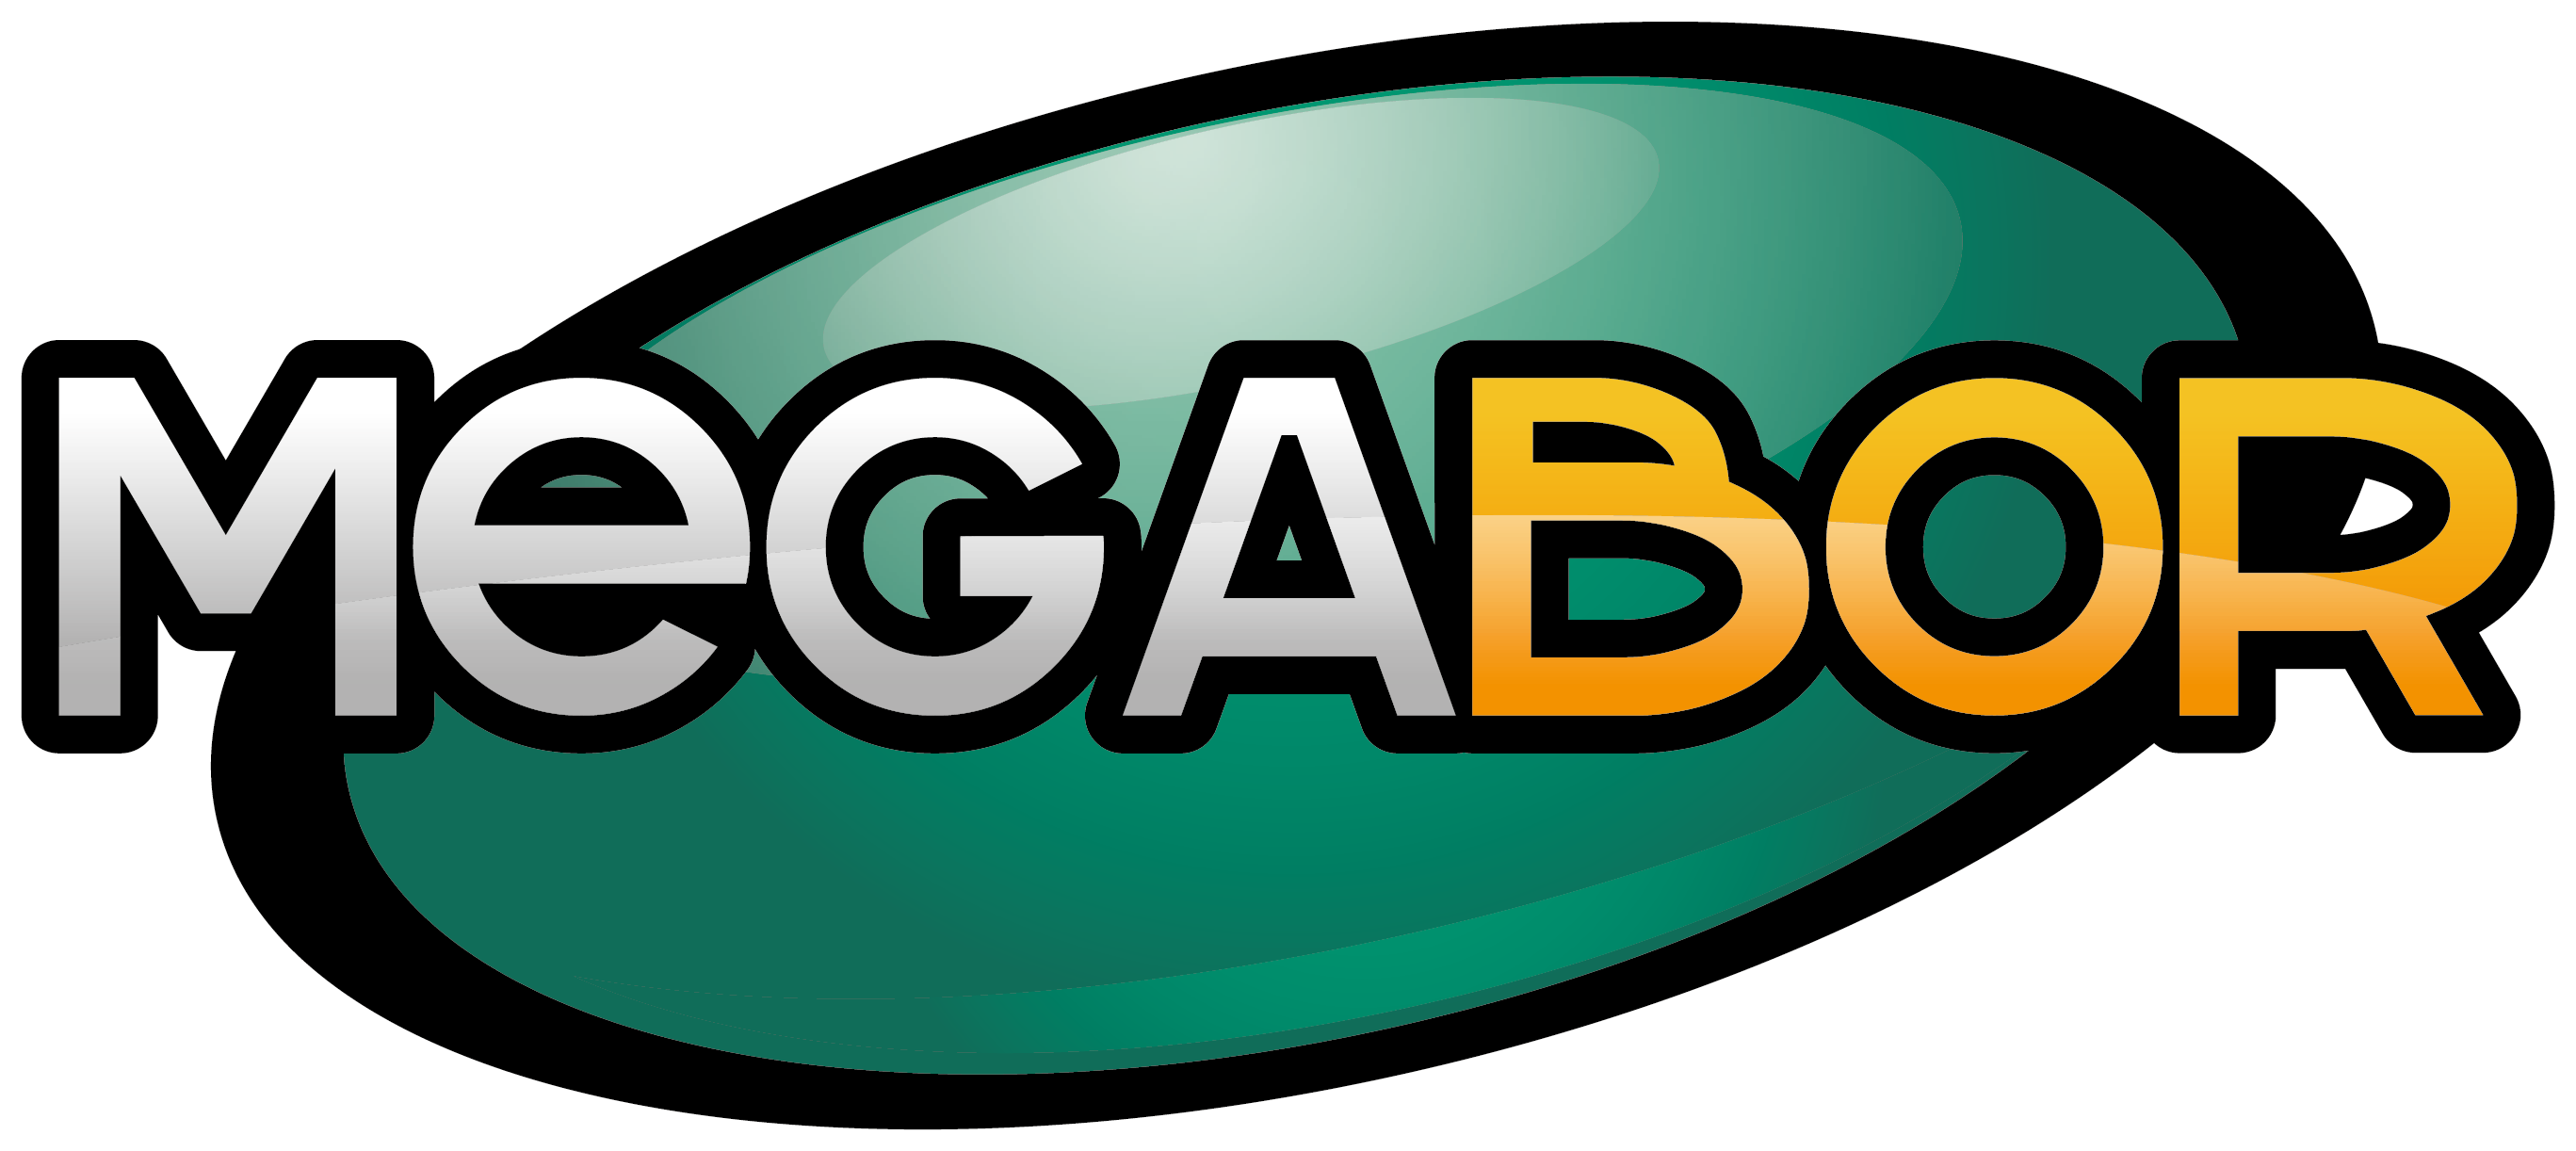 Megabor Borrachas